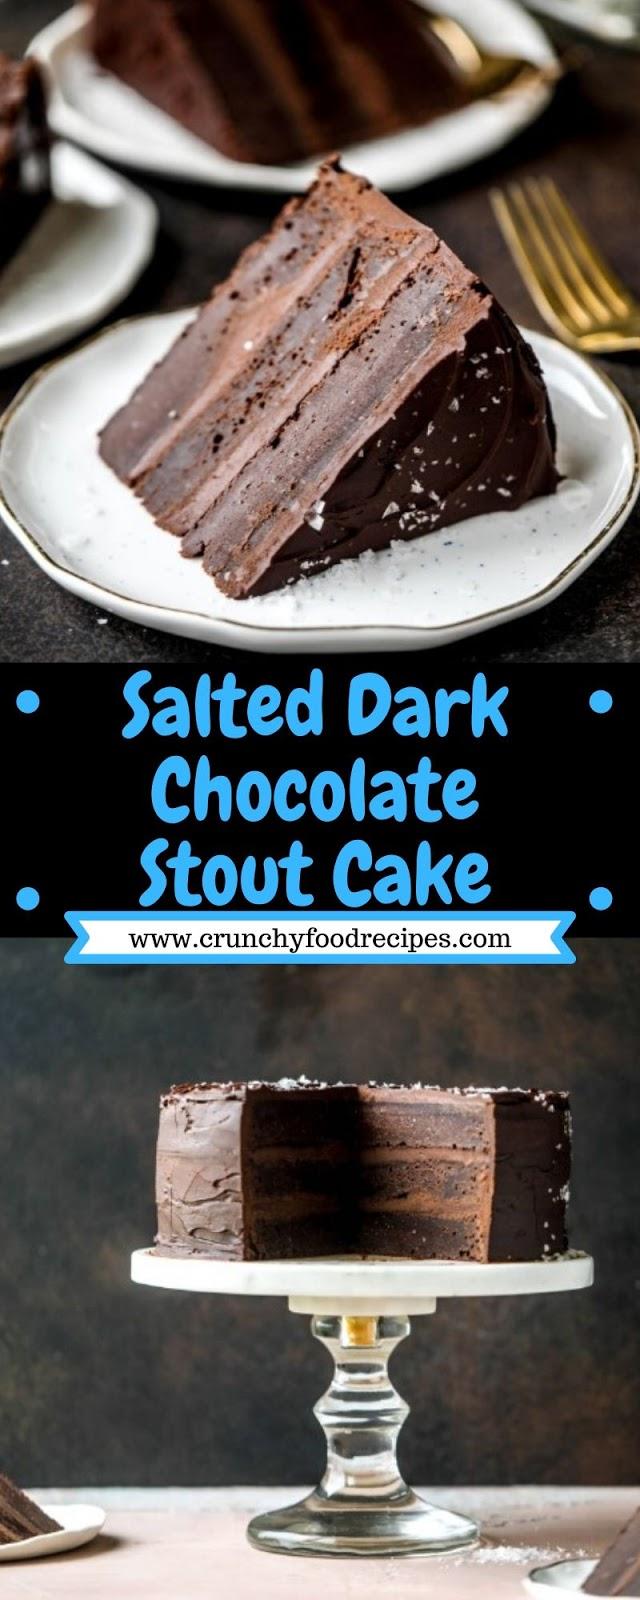 Salted Dark Chocolate Stout Cake